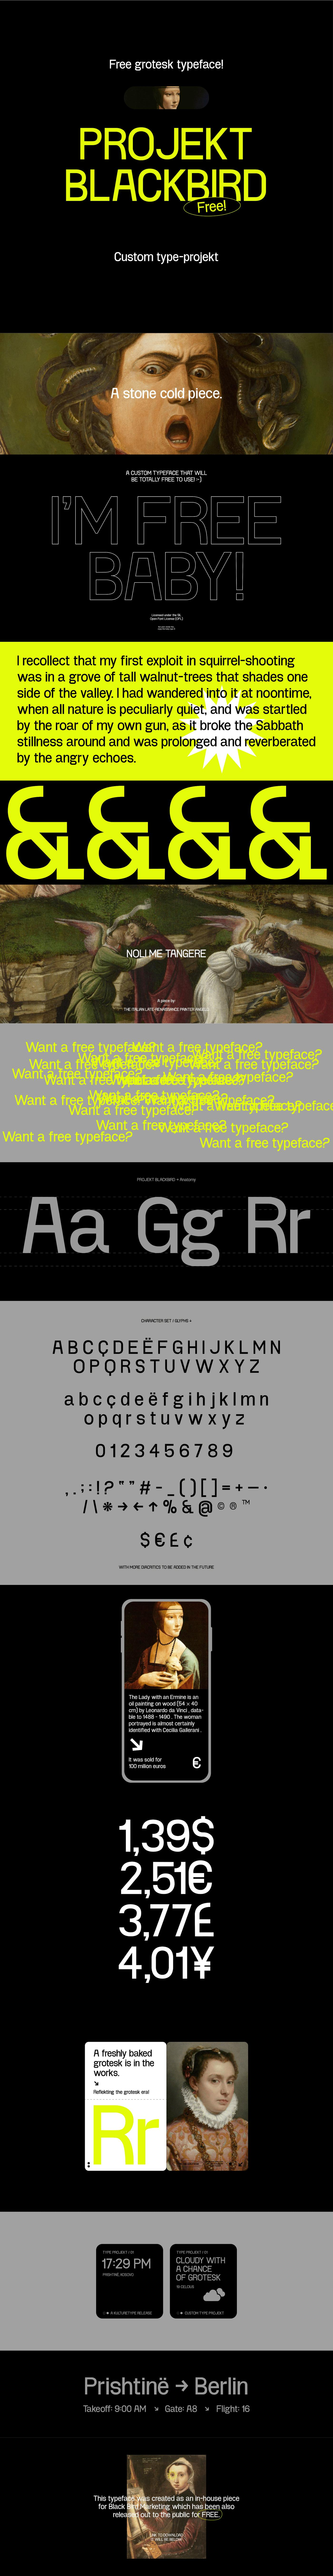 Display font free freebie sans sans serif Script serif type Typeface